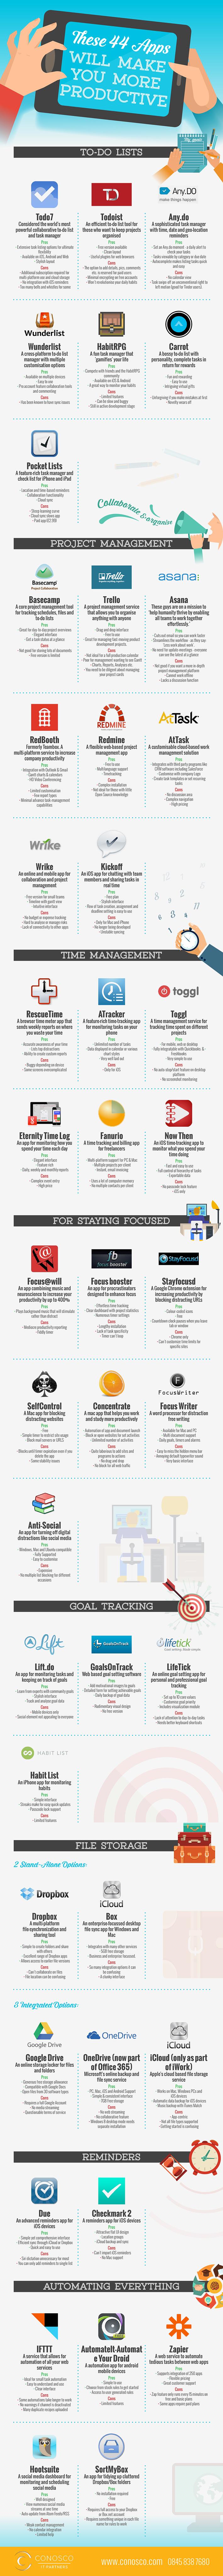 44-apps-productividad